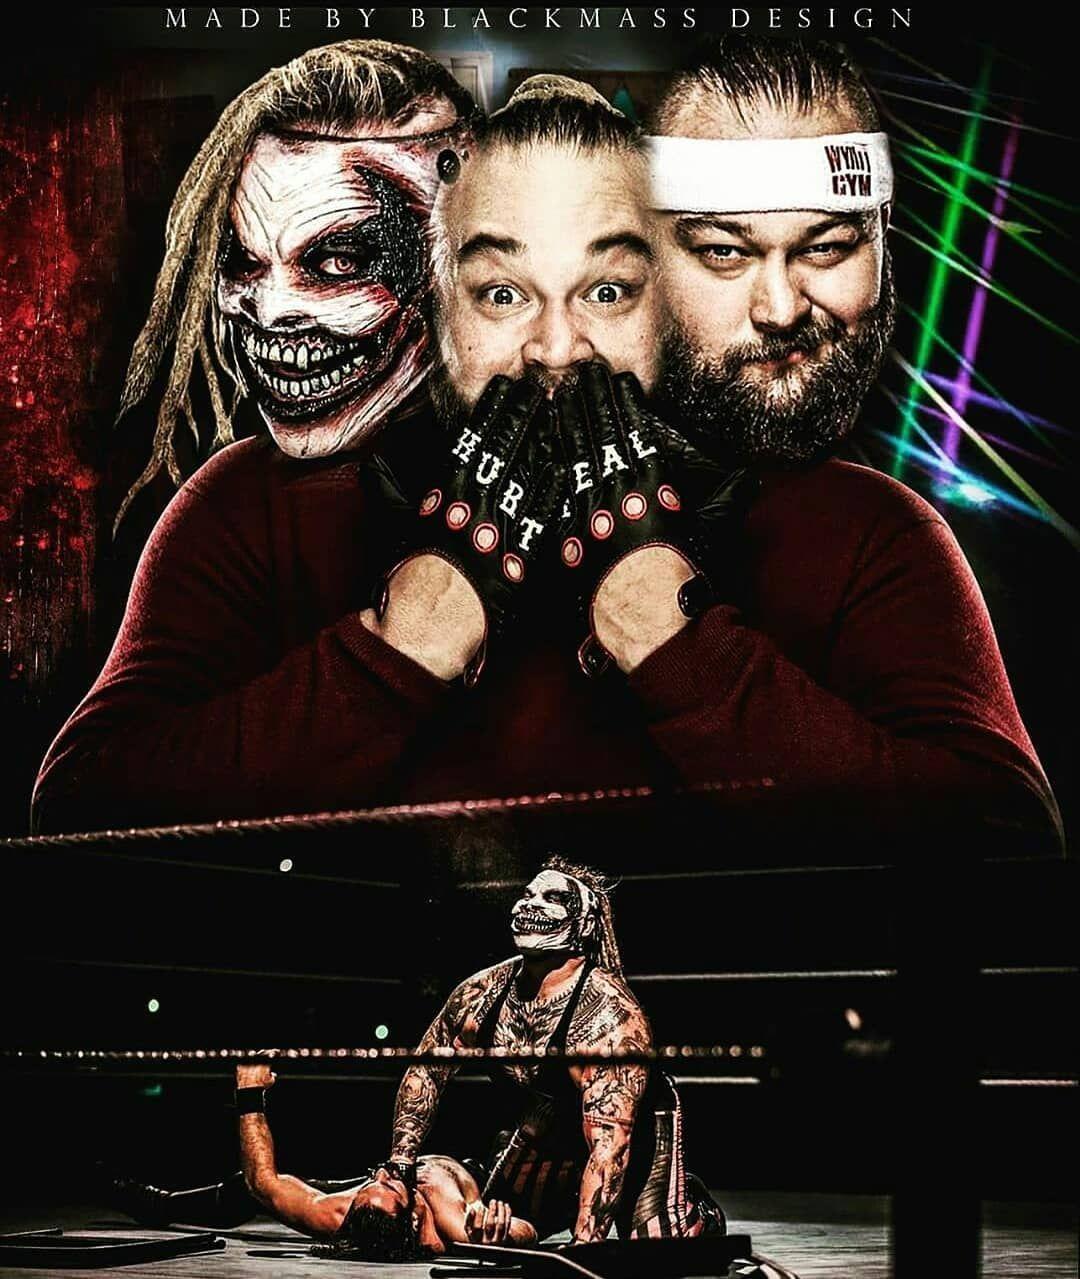 The Fiend Bray Wyatt On Instagram Yowie Wowie Yowiewowie Fanartsaturday Letmein Wwe Bray Wyatt Bray Wyatt Wwe Pictures